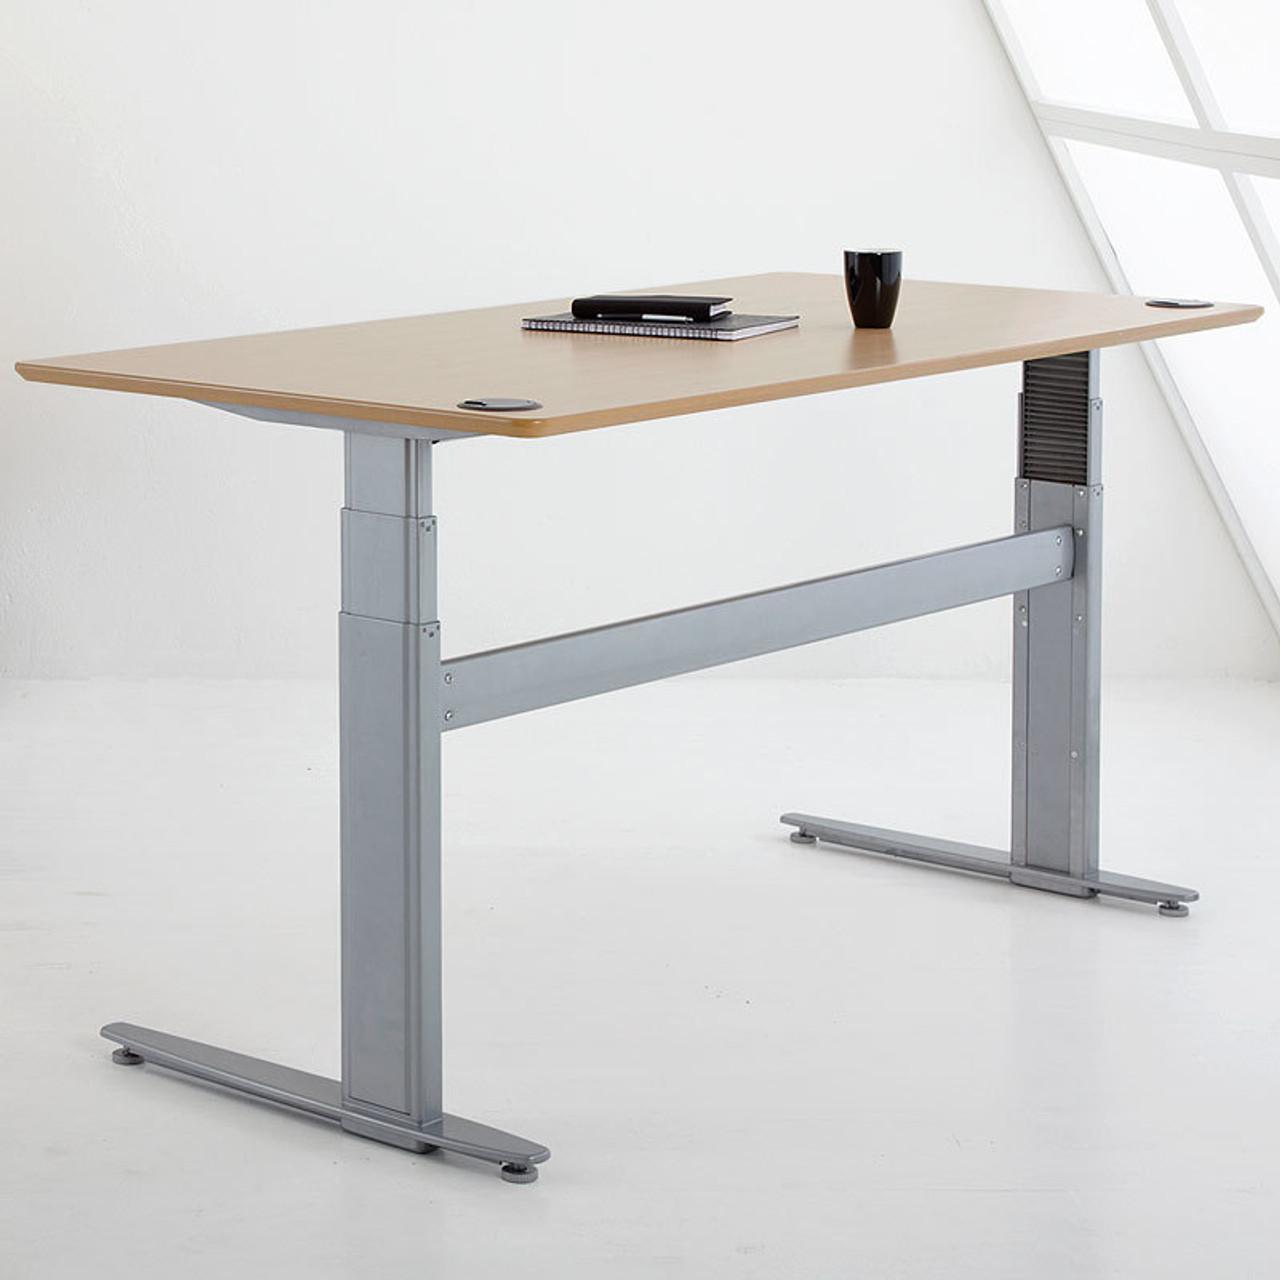 Conset 501 27 height adjustable motorized desk 21 47 sit for Motorized adjustable height desk